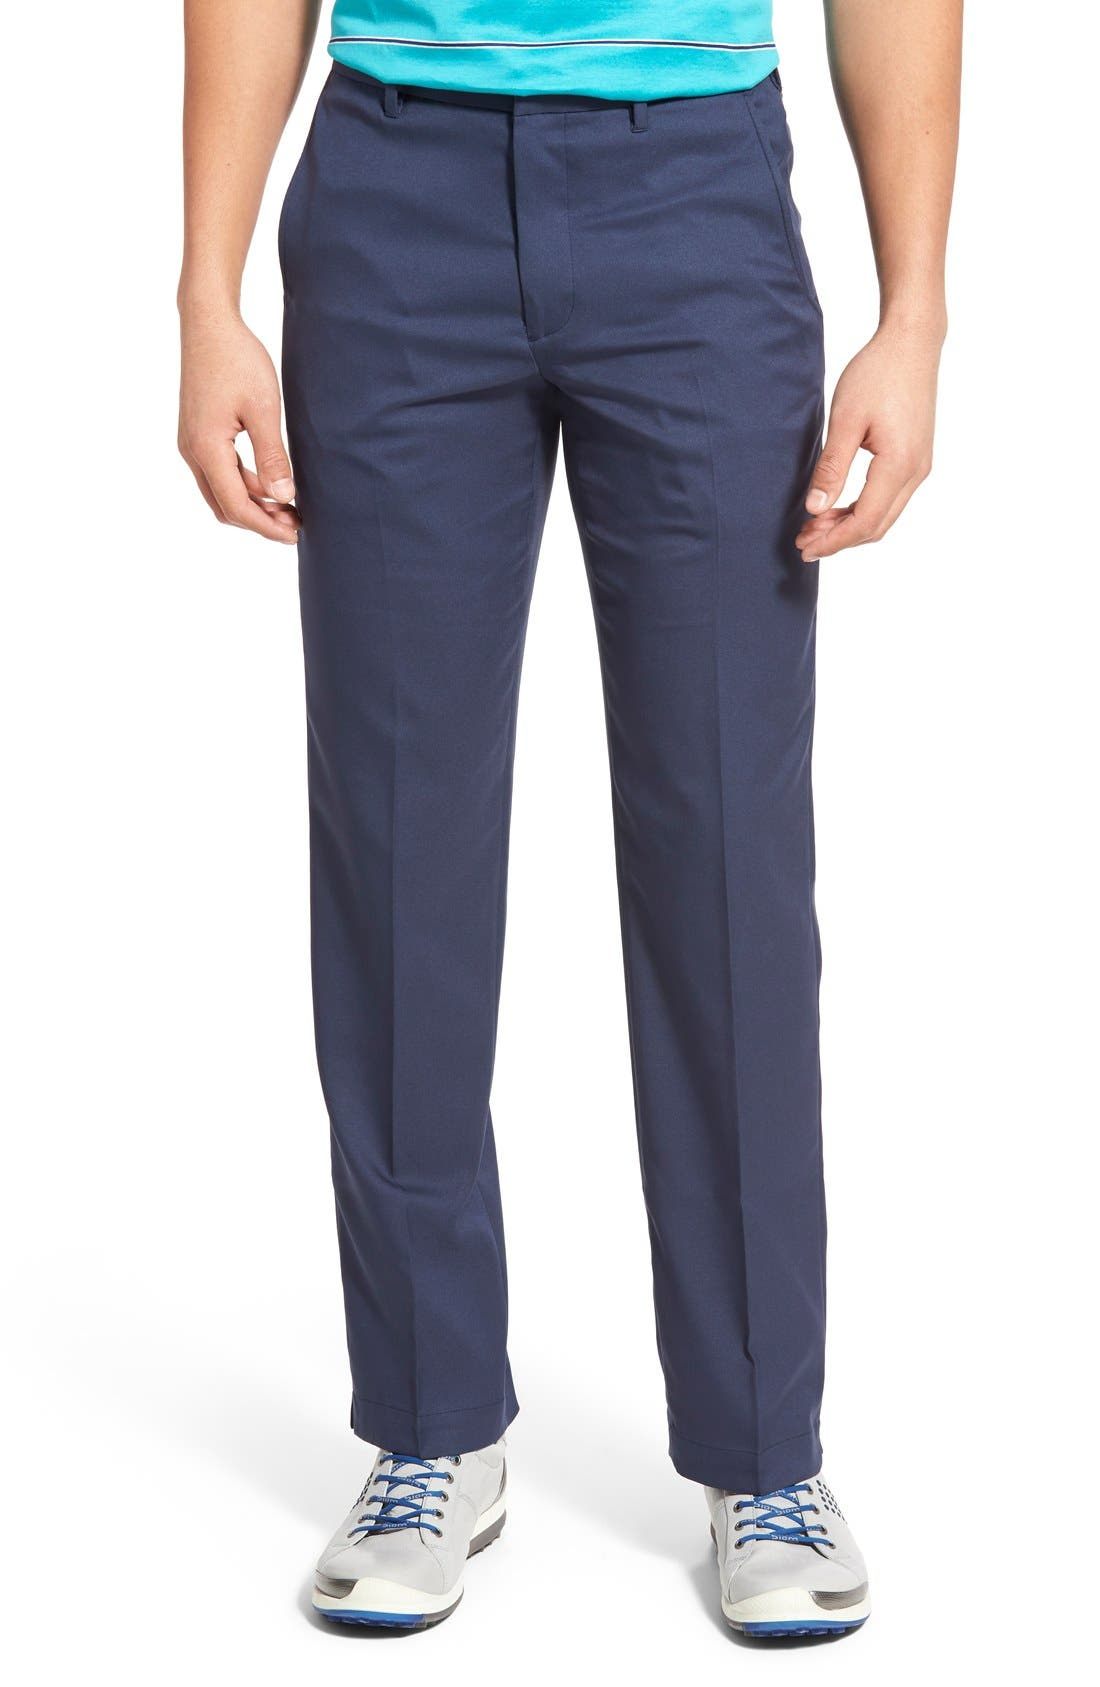 BOBBY JONES Tech Flat Front Wrinkle Free Golf Pants